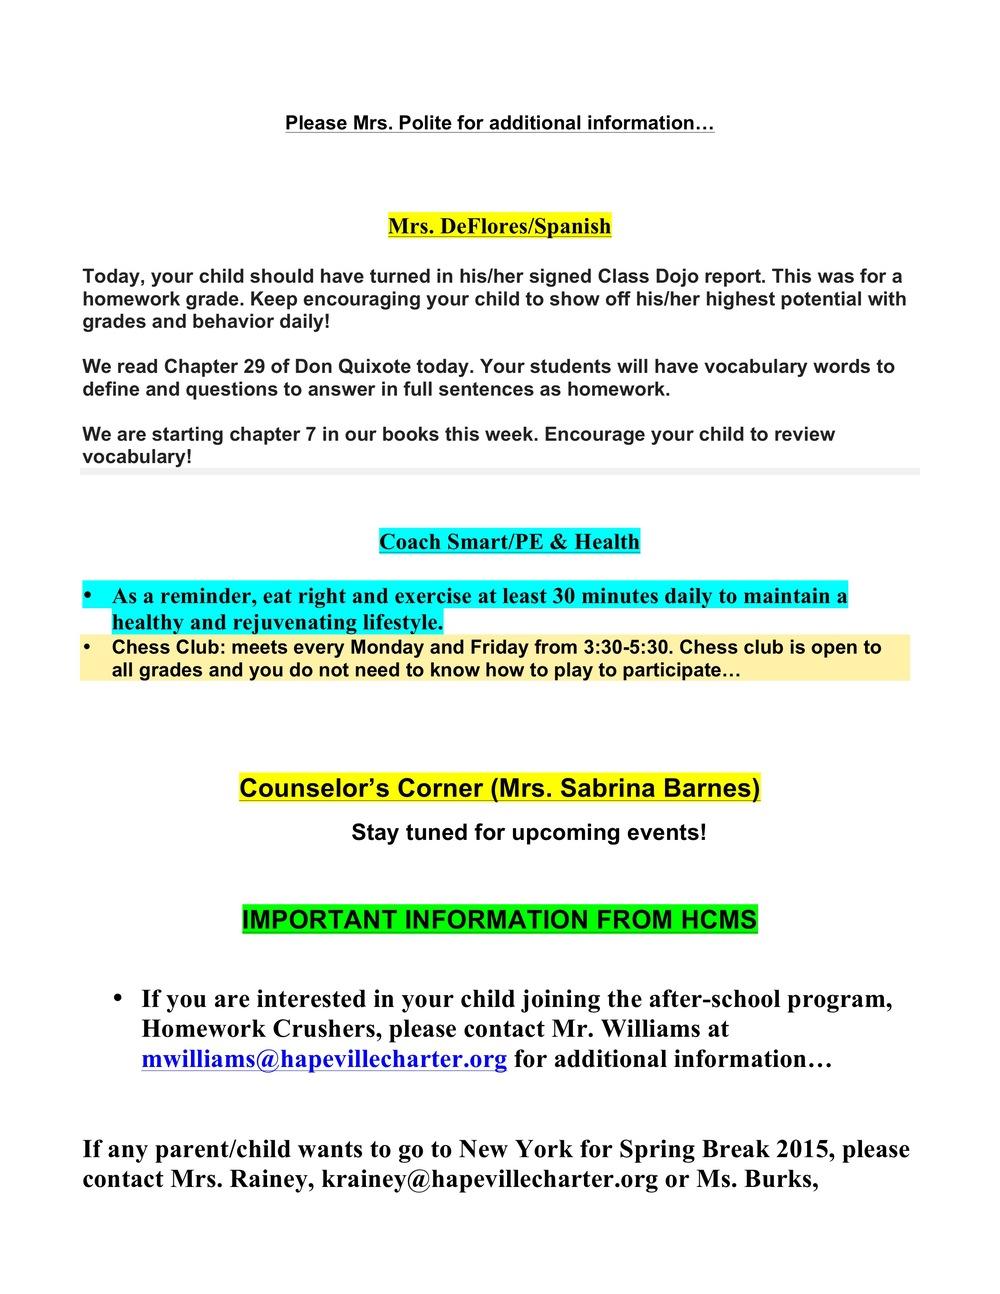 Newsletter Image7th grade January 26, 2015 4.jpeg